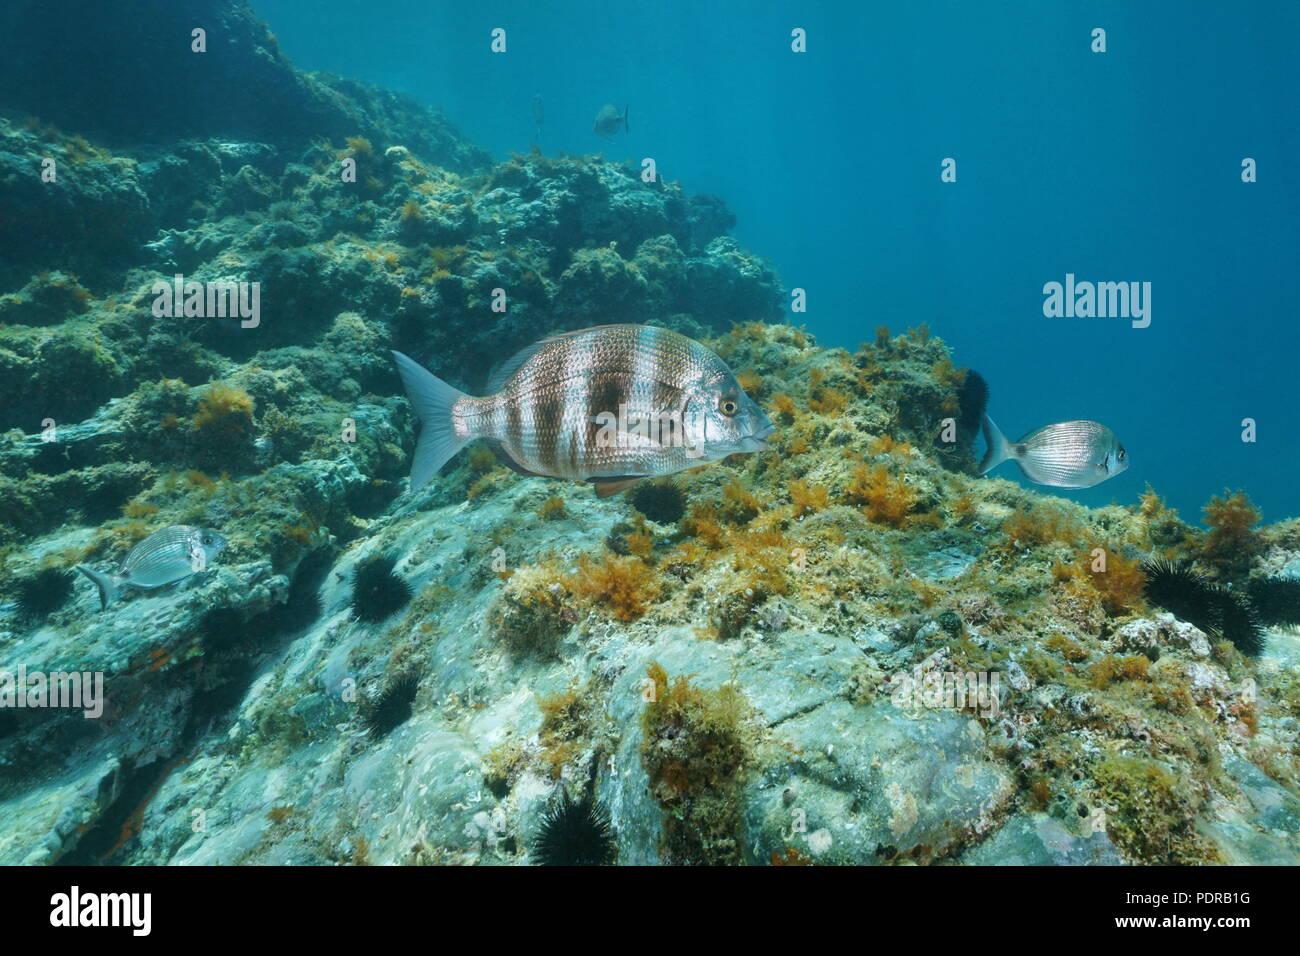 A zebra sea bream fish, Diplodus cervinus underwater in the Mediterranean sea, Pyrenees-Orientales, Roussillon, France Stock Photo